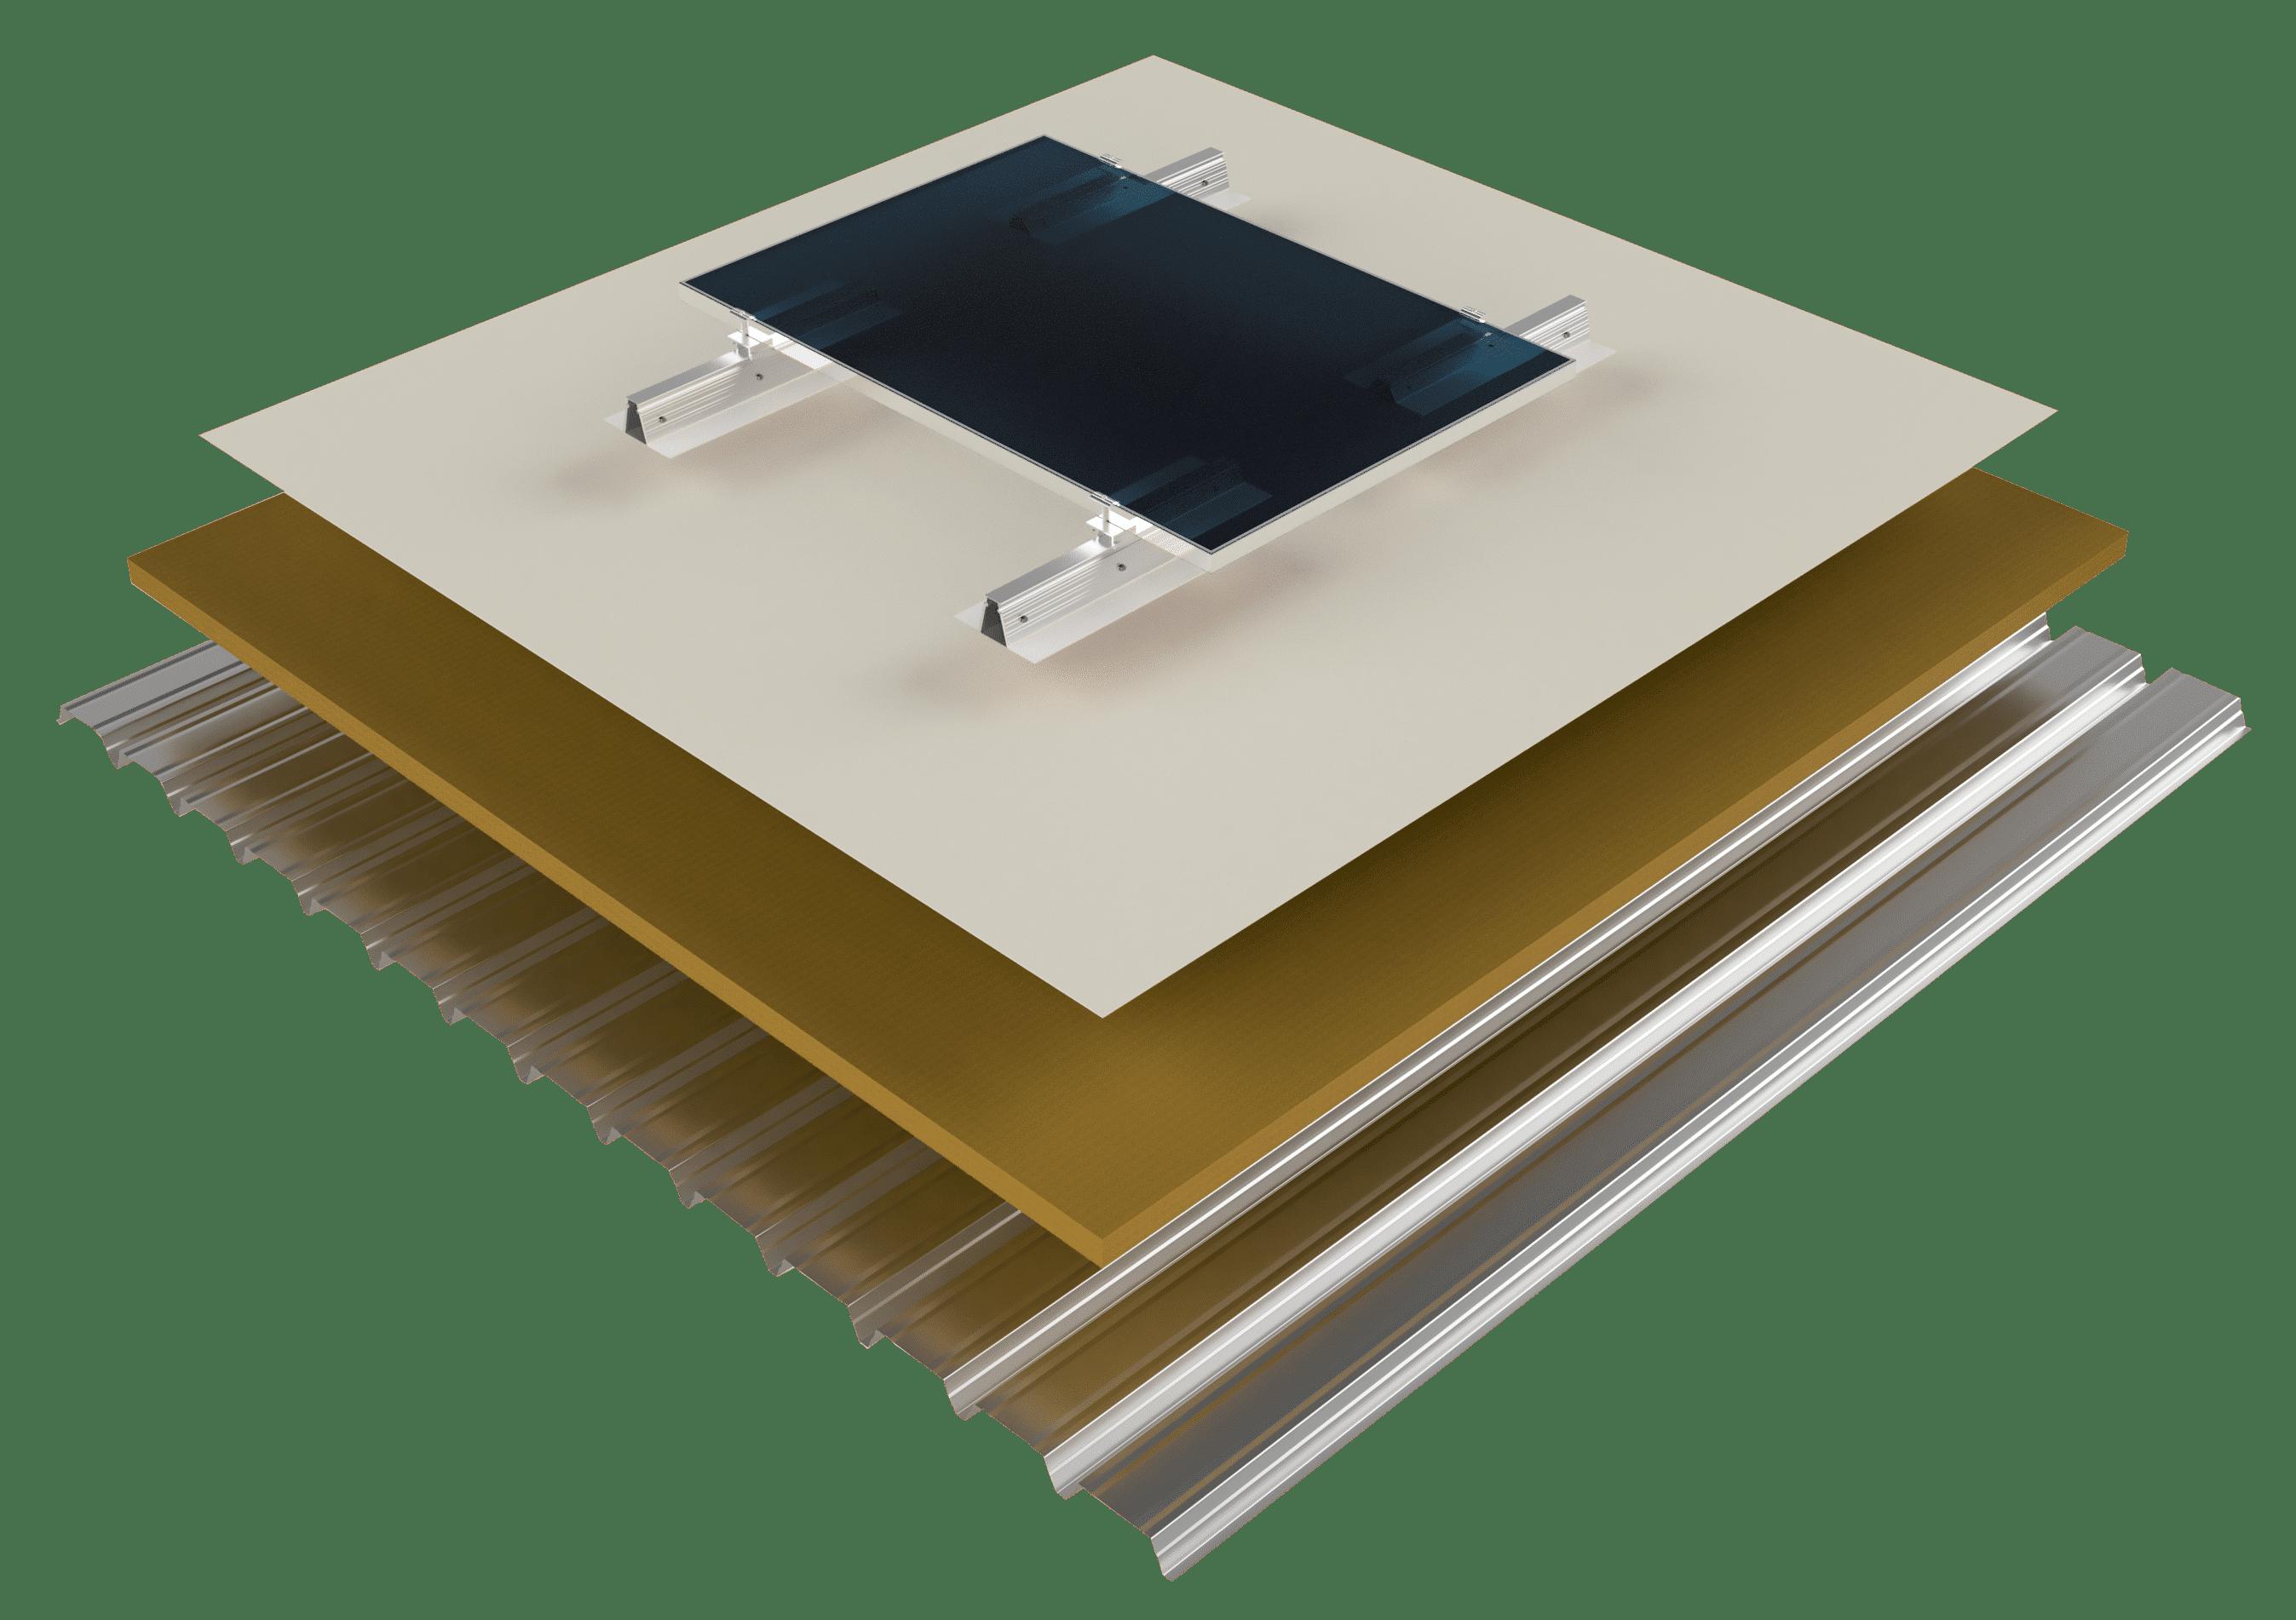 Solar-pv-mounting-system-TPO-membrane